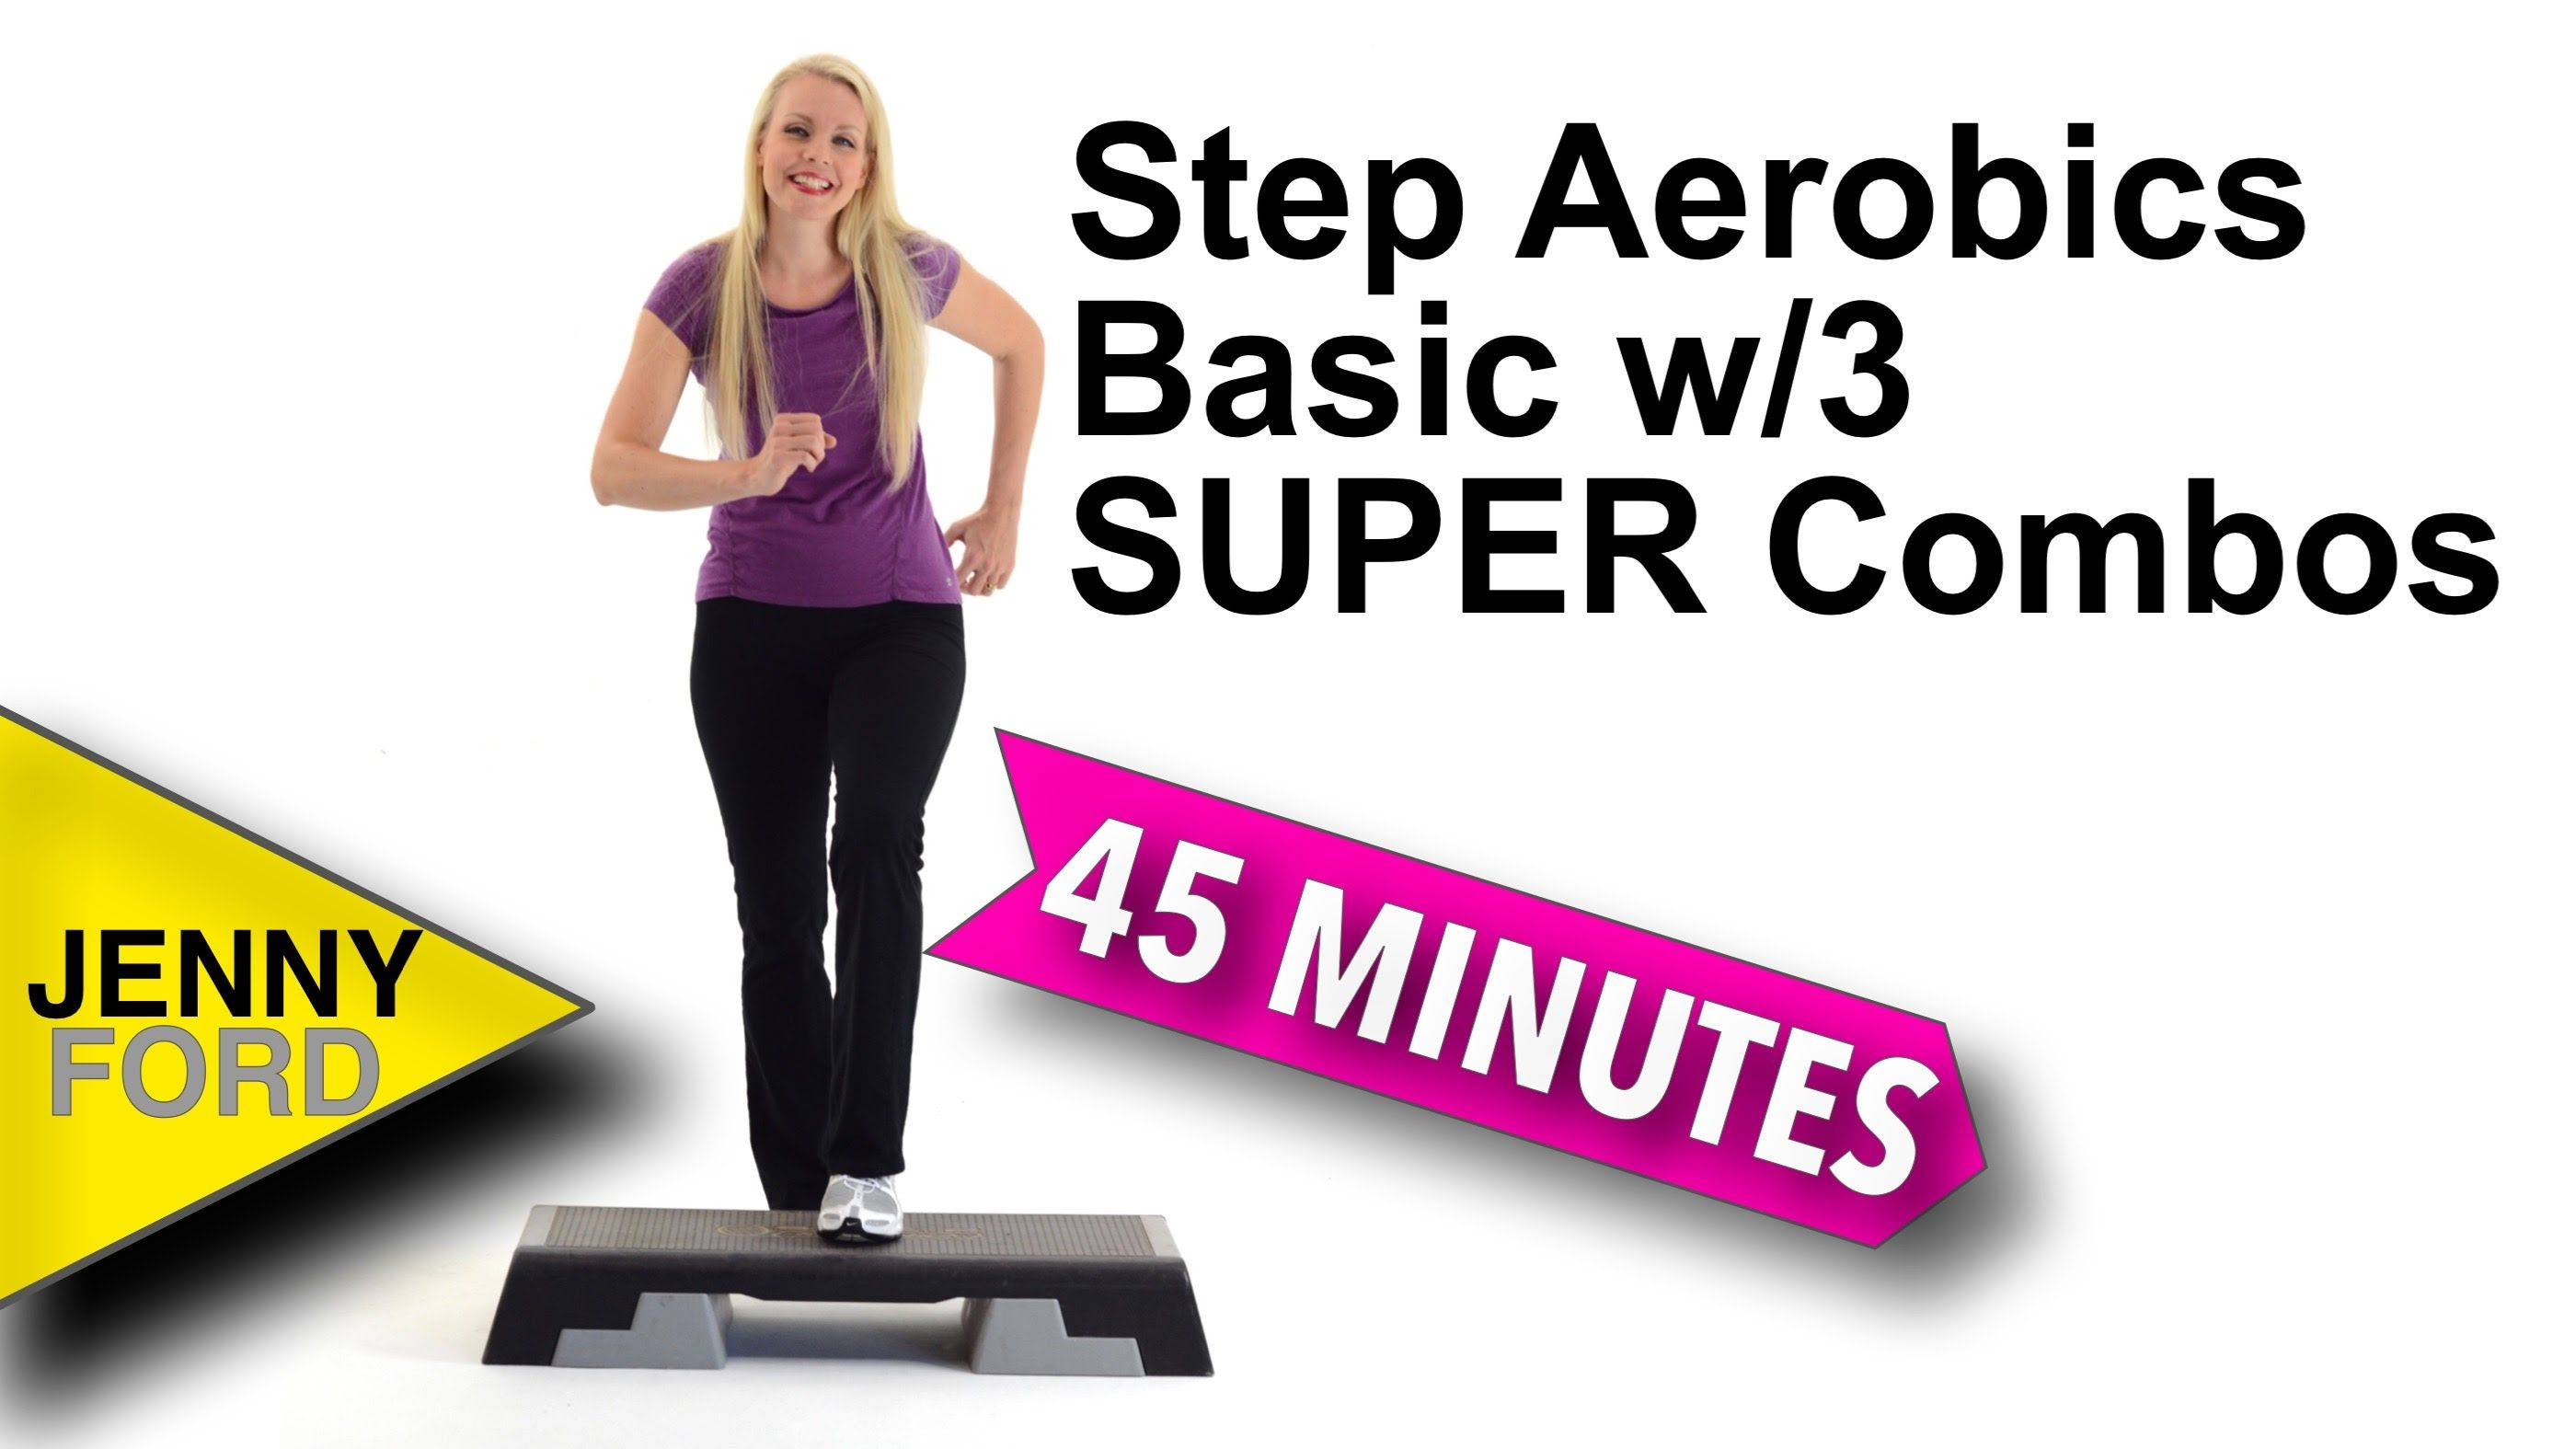 Step Aerobics Basic W 3 Super Combos Step Aerobics Step Aerobic